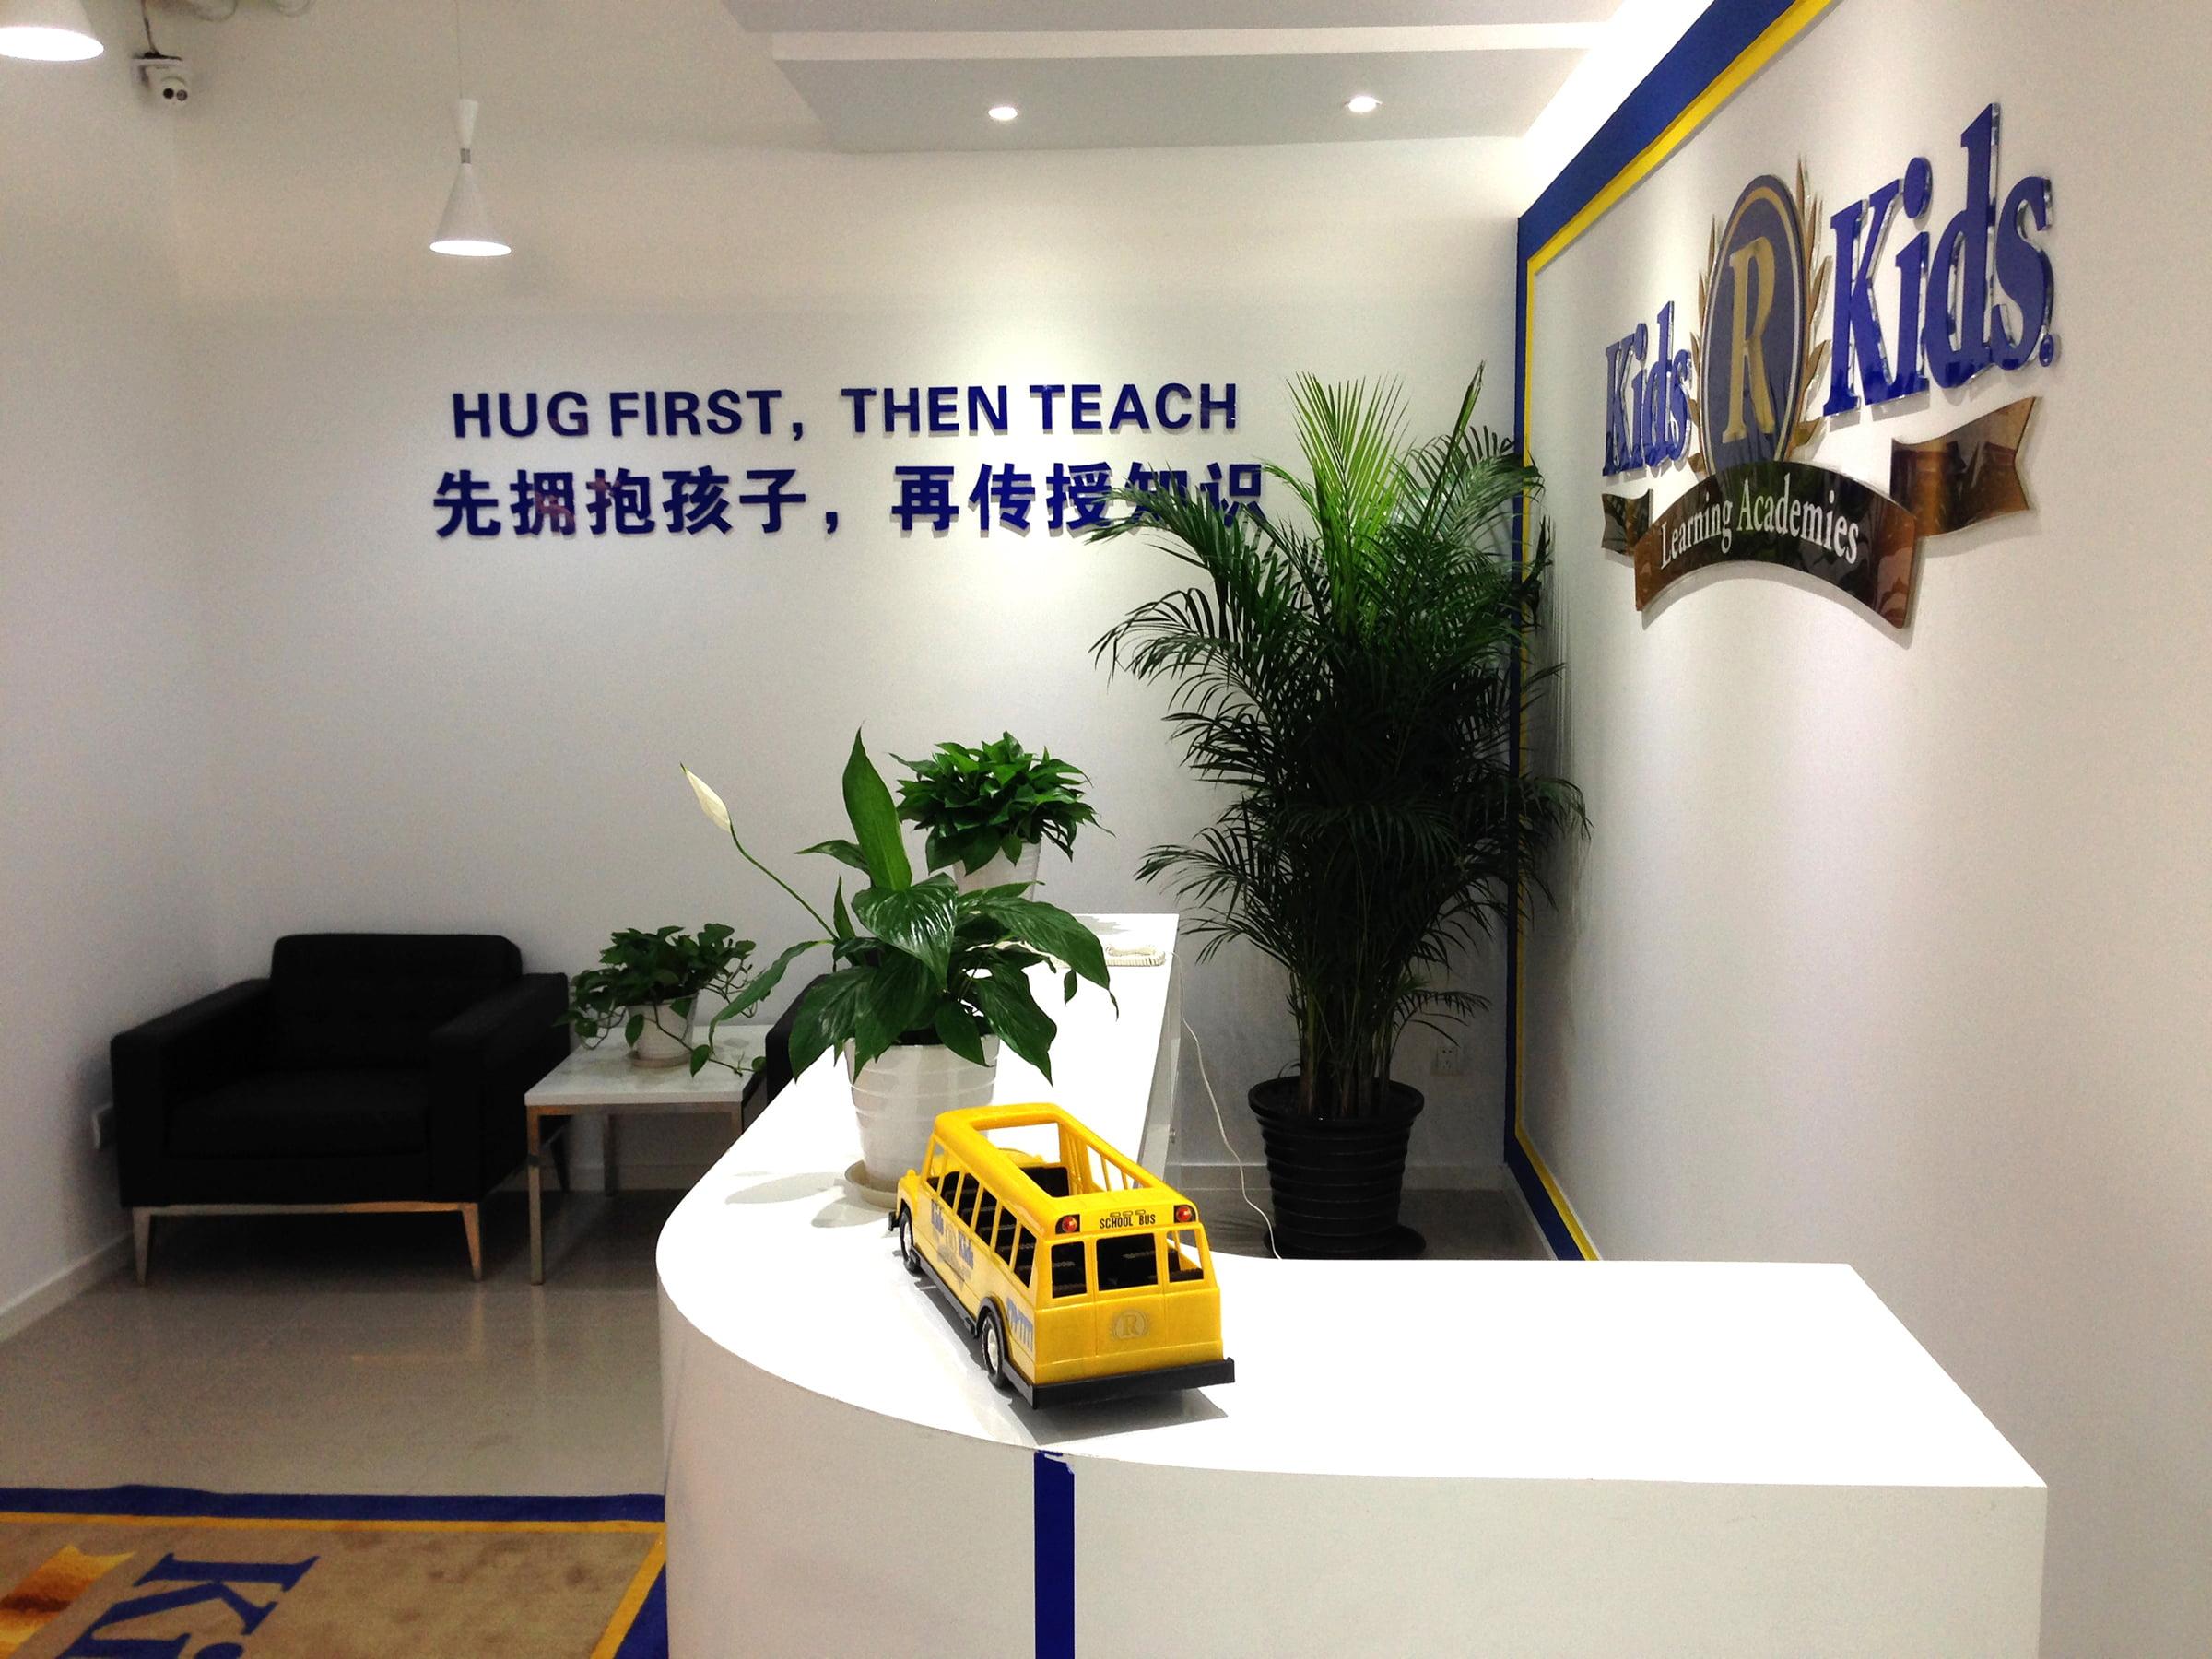 Kids R Kids Corporate China Store